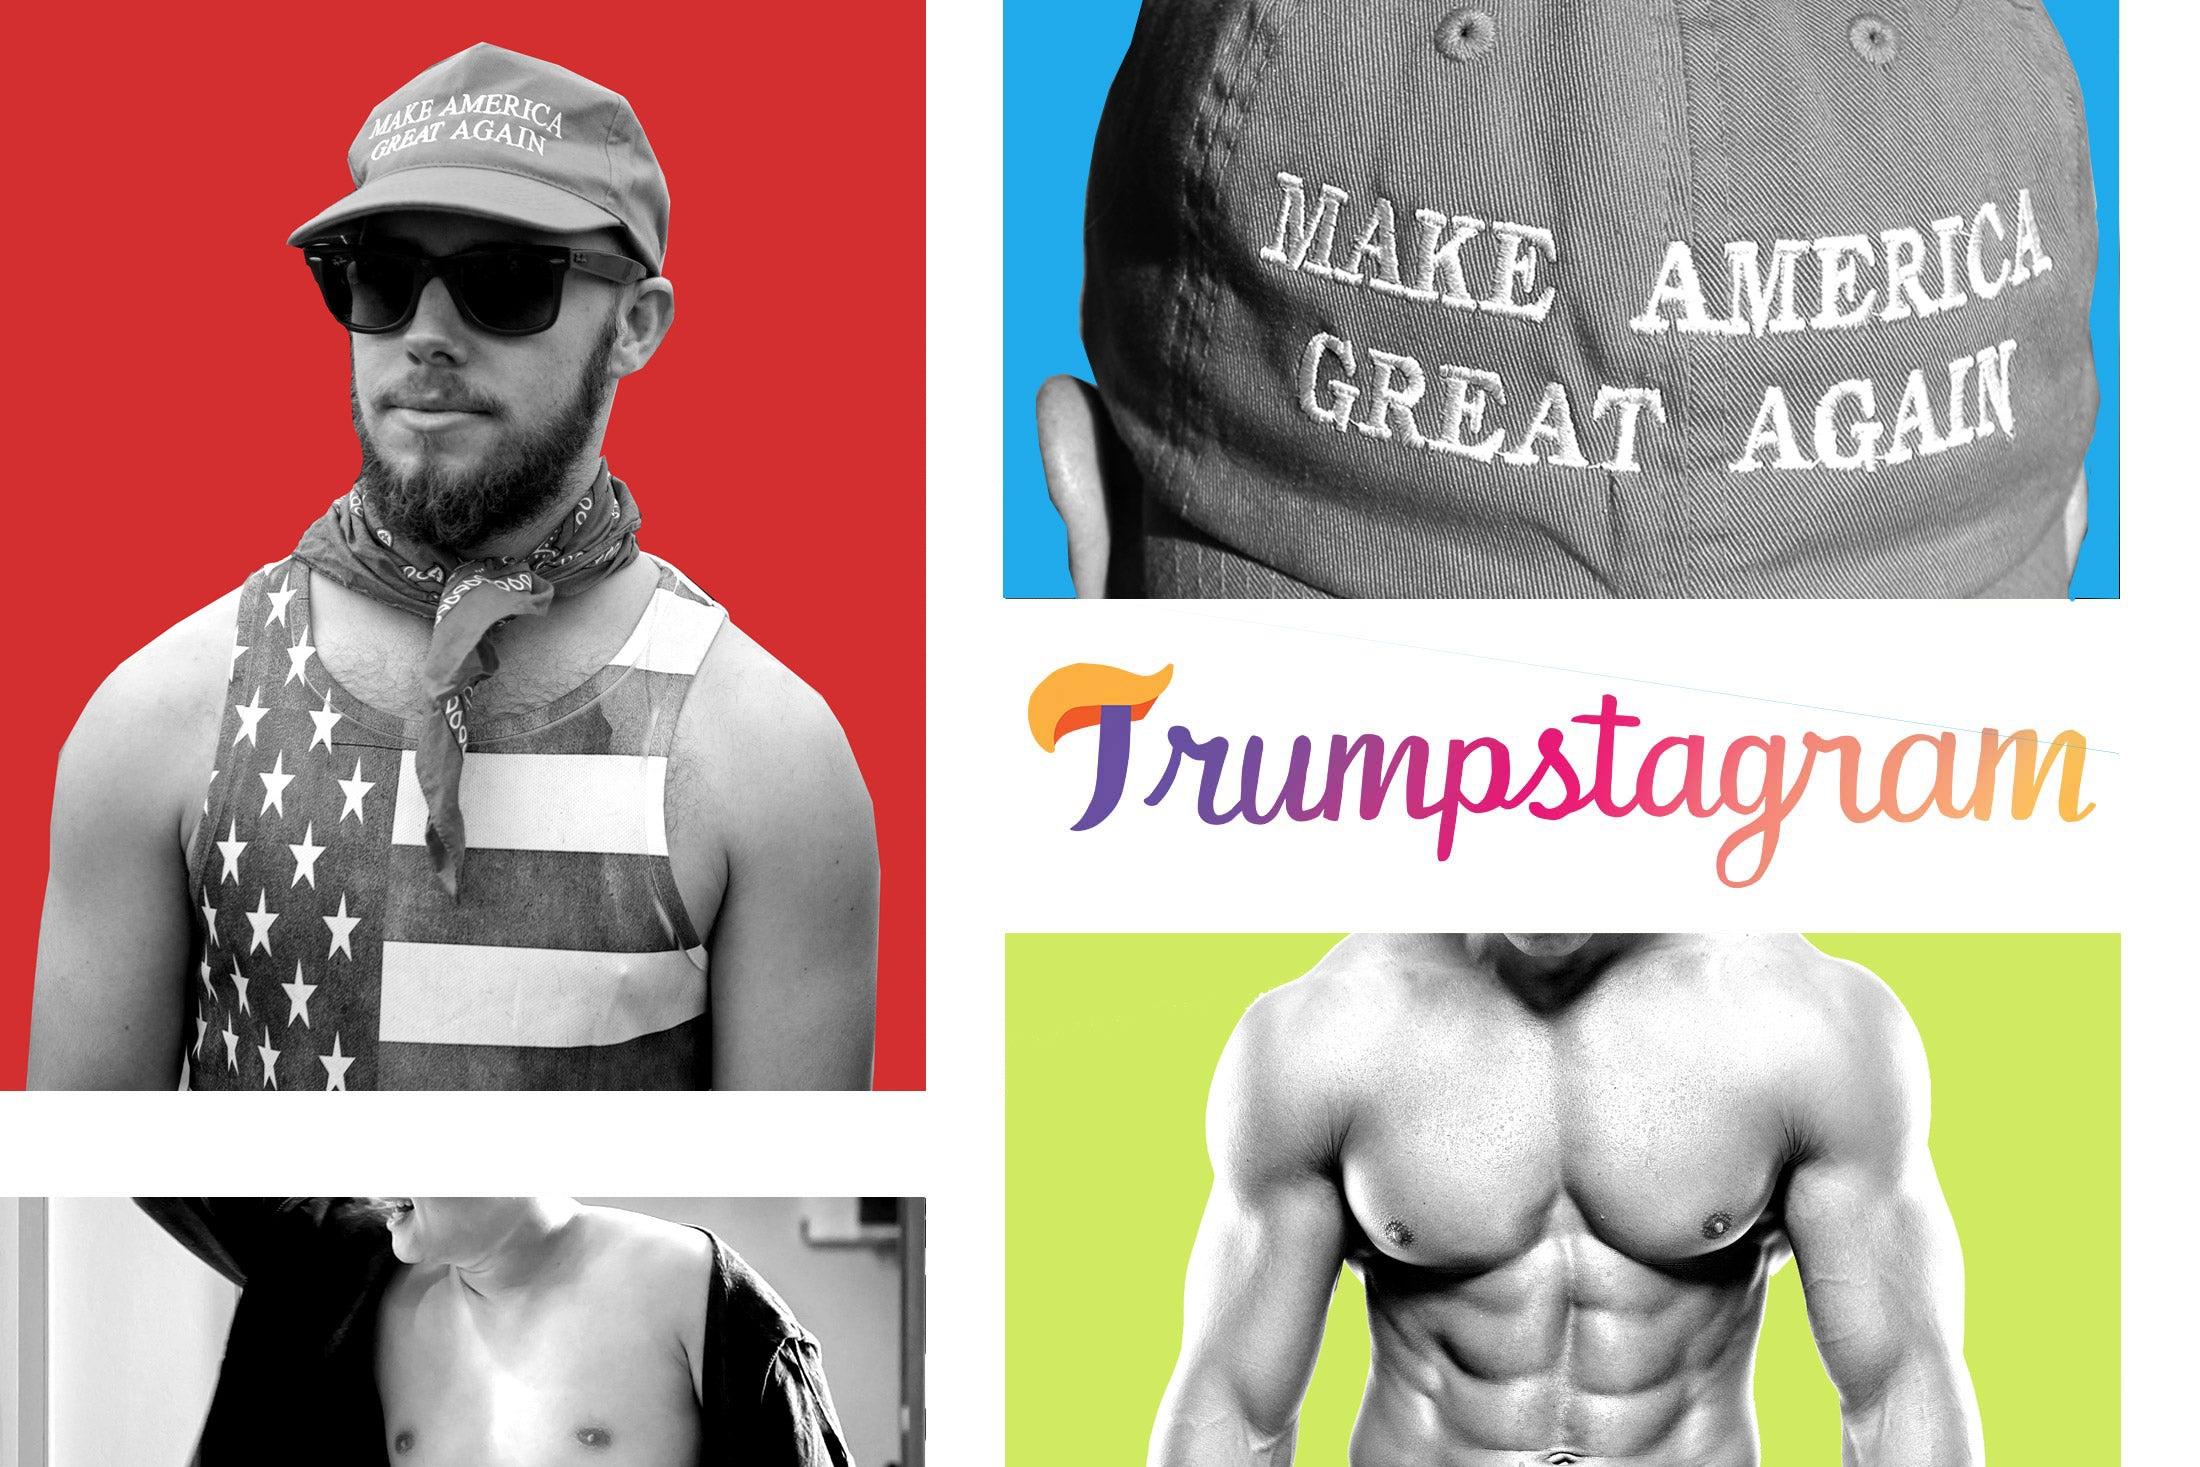 Photo illustration: Shirtless men, a MAGA hat, and the Trumpstagram logo.